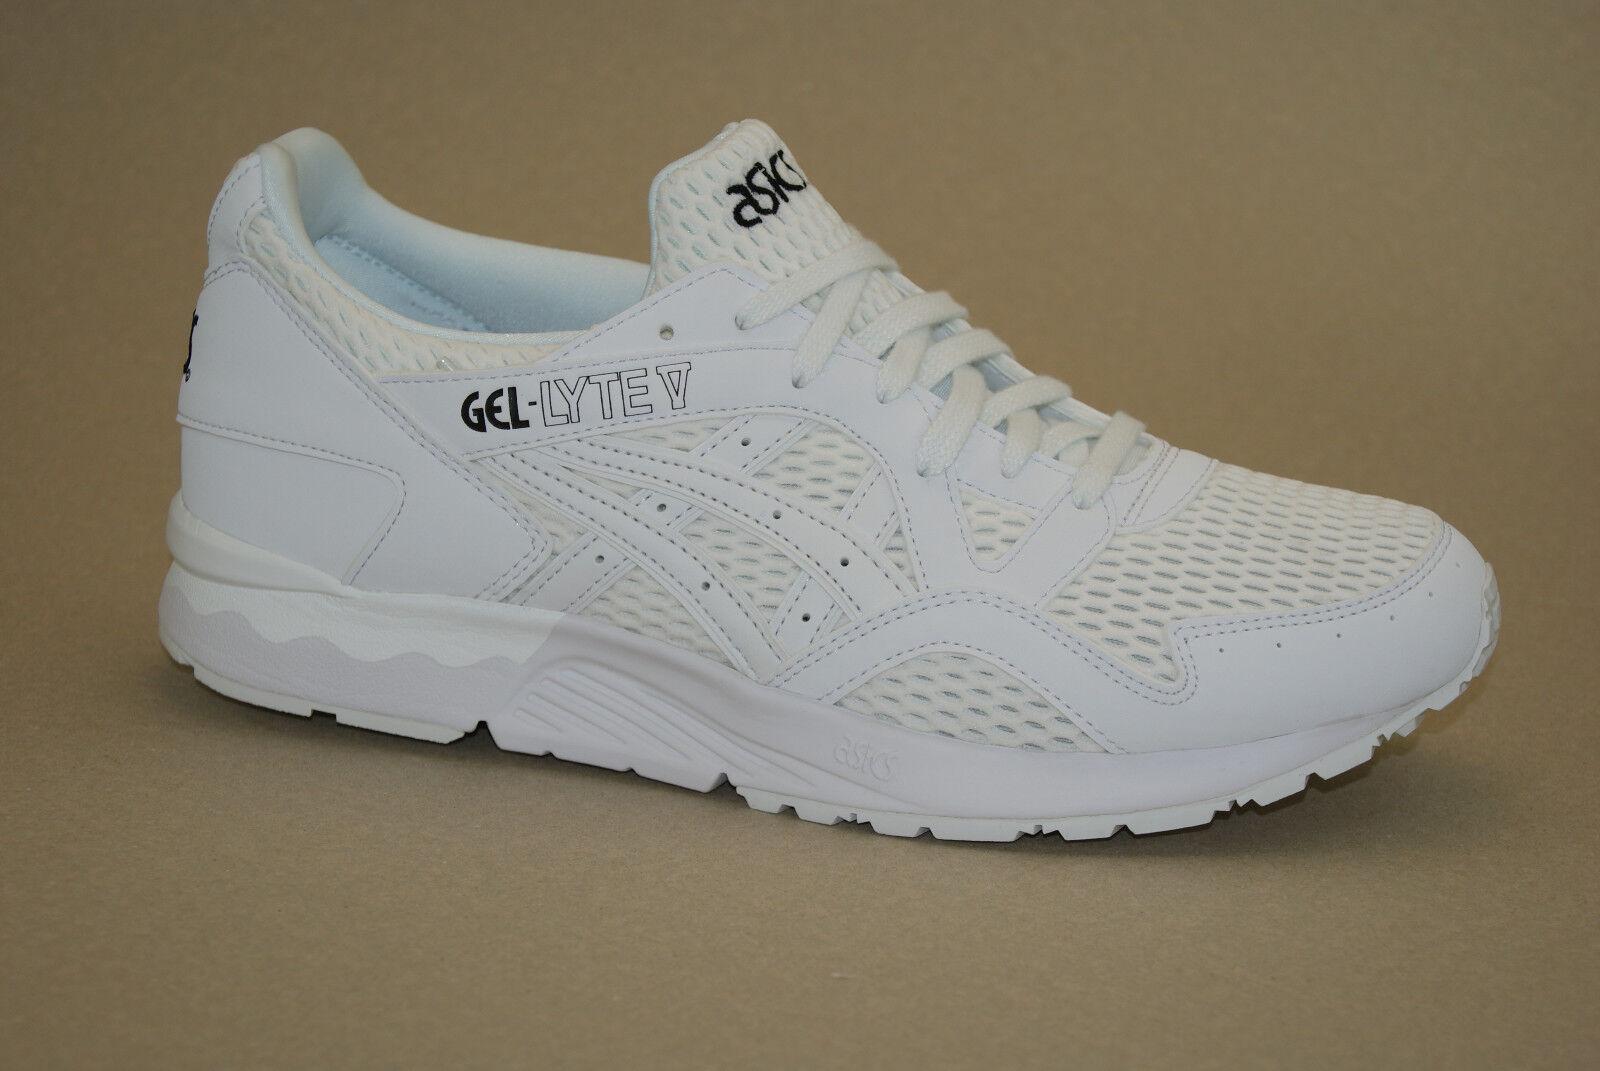 Asics Sneakers Gel-Lyte V 5 Turnschuhe Sneakers Asics Sportschuhe Herren Damen Freizeitschuhe e4c358